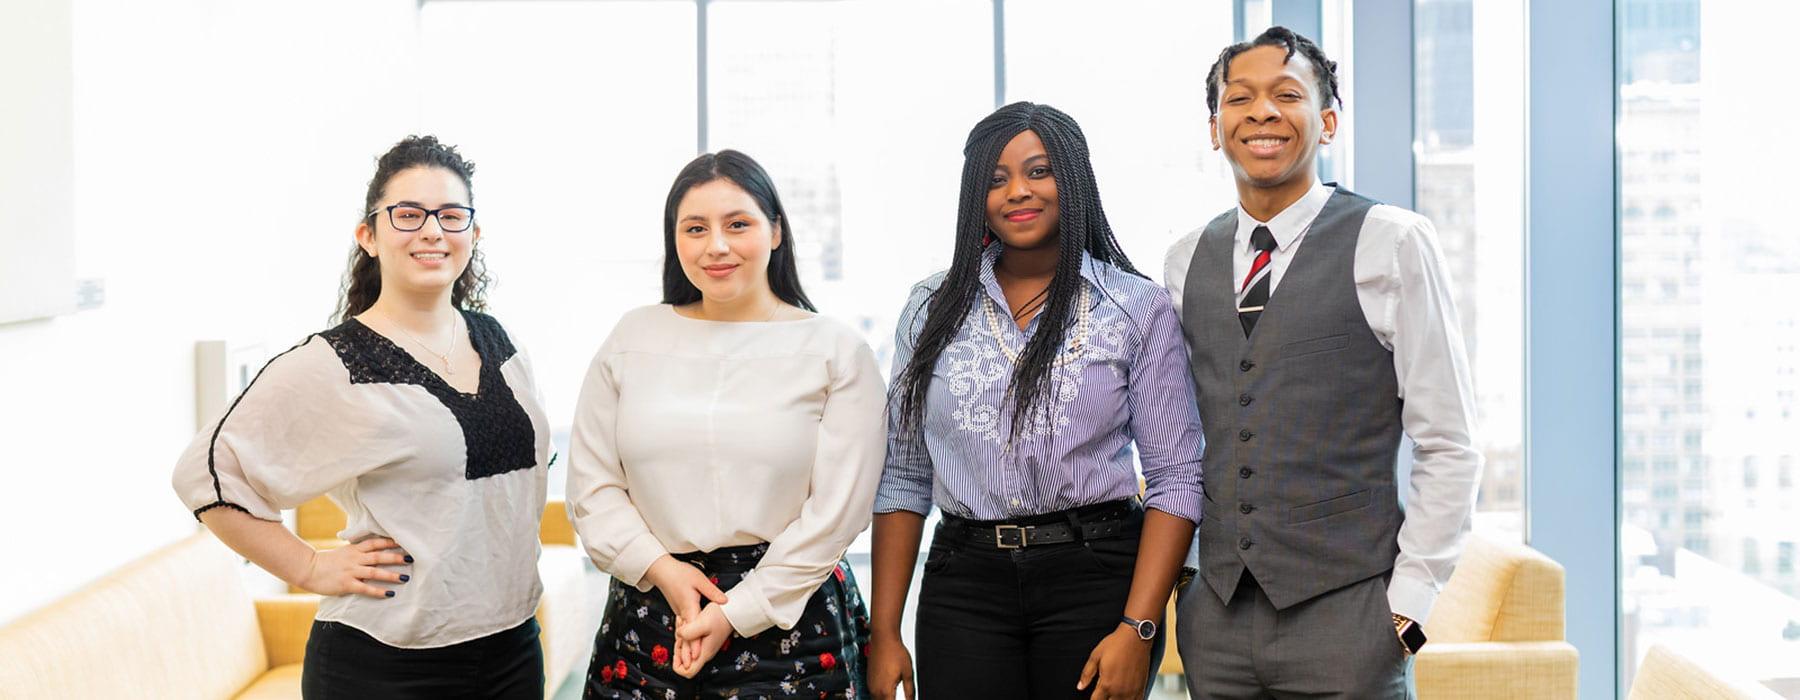 Golin Fellows Karina Herrera, Alondra Ibarra, Abisola Ajayi and Darryl Langston Jr.